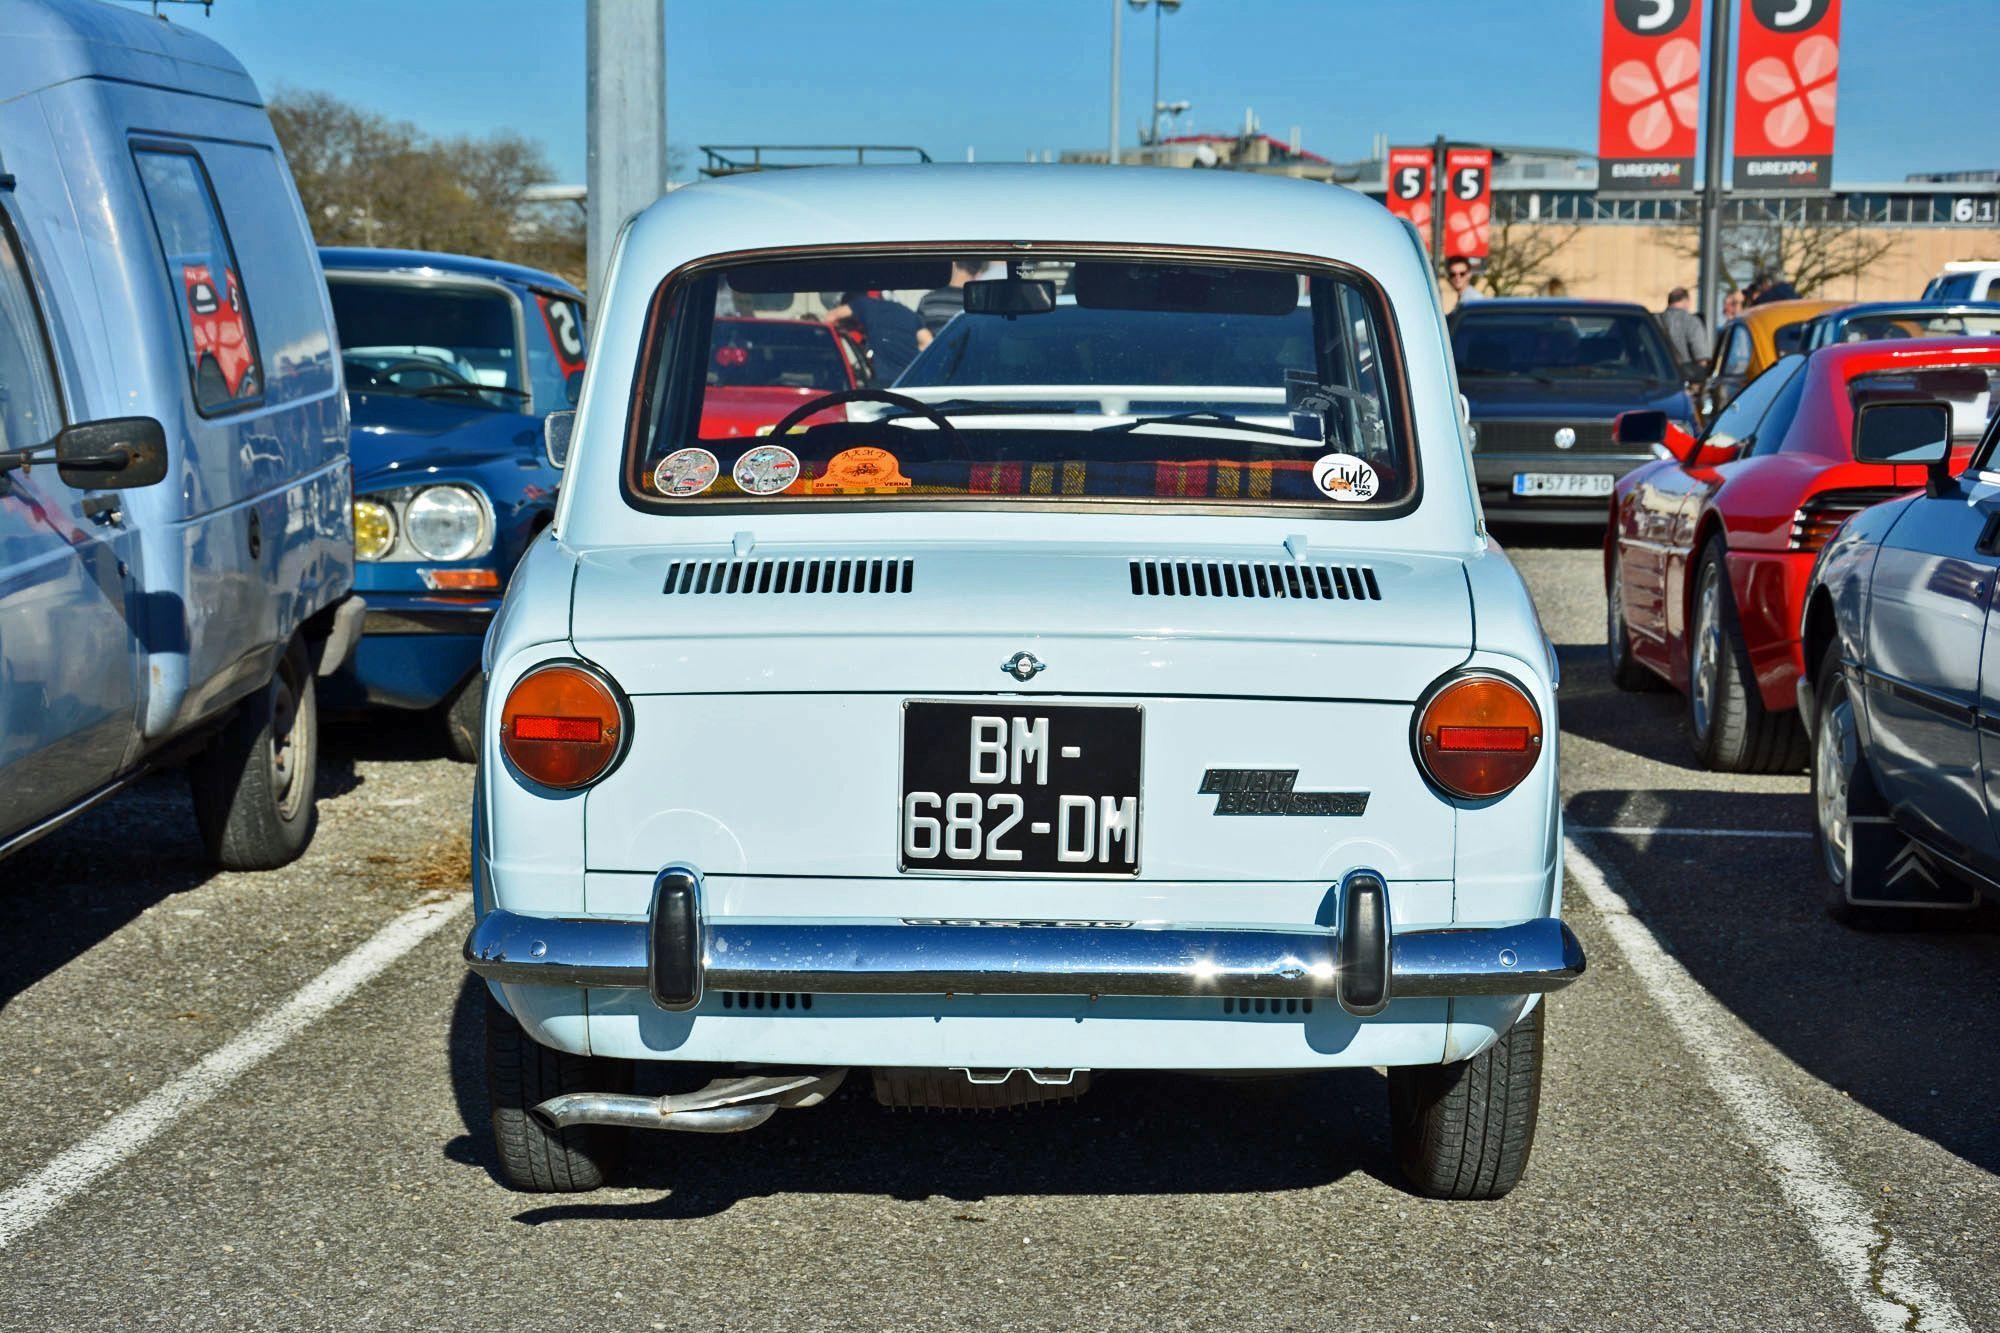 Cruising Lyon\'s Epoqu\'Auto car show | Old Rides | Pinterest | Cars